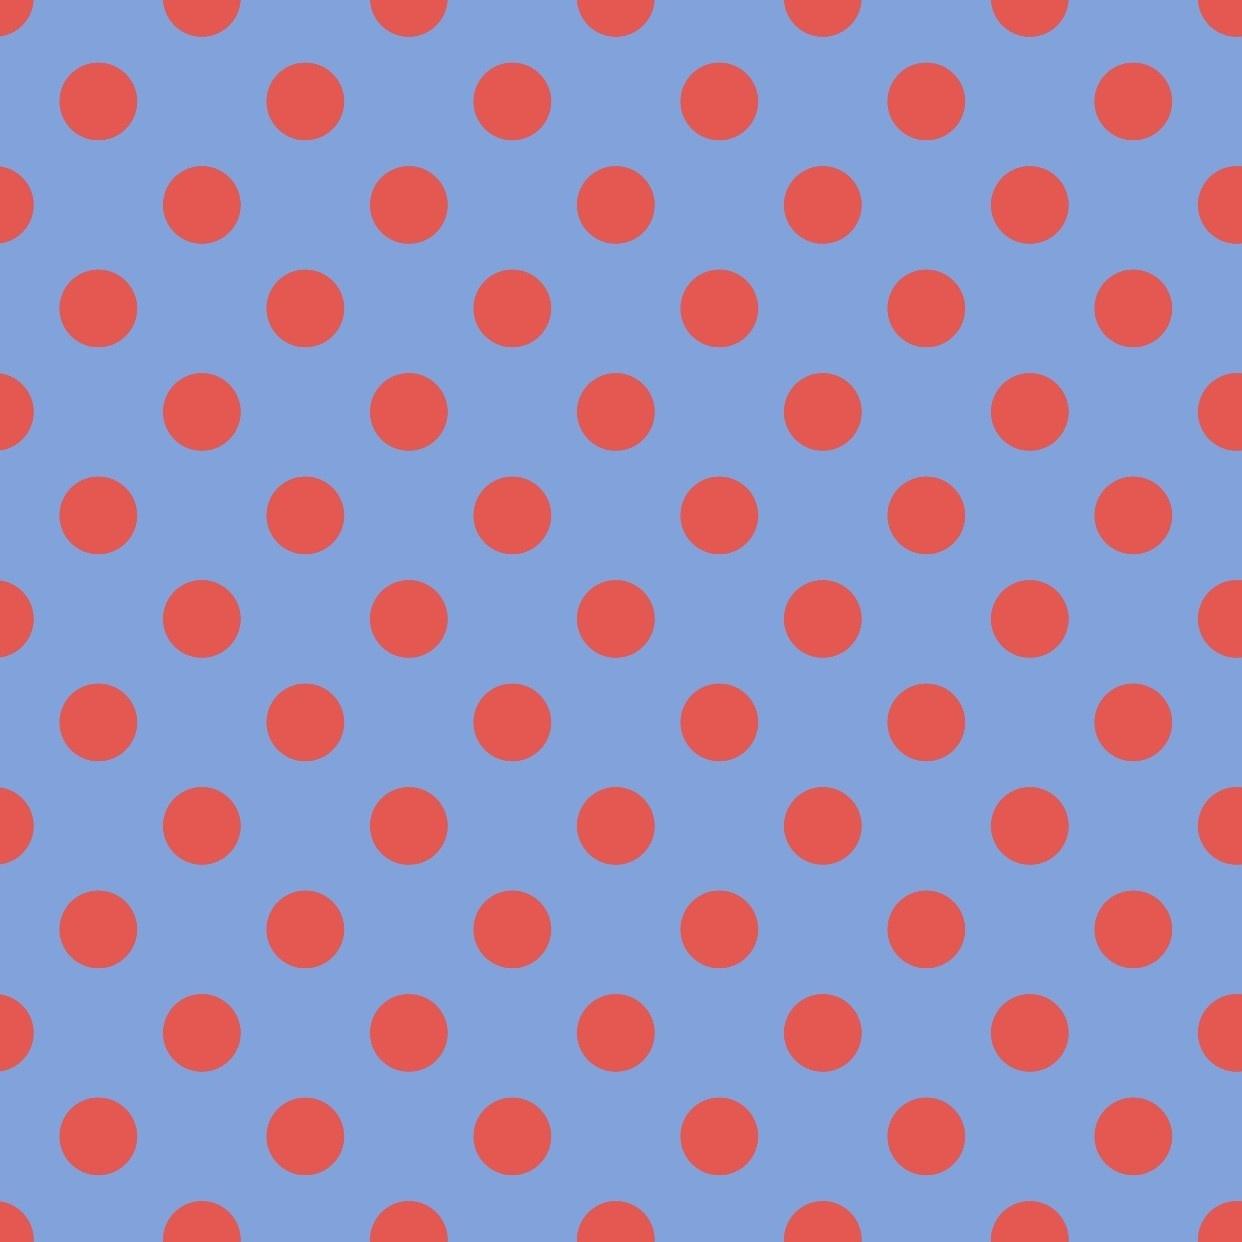 TULA PINK HOMEMADE Pom Pom Dots, Lupine, per cm or $17/m